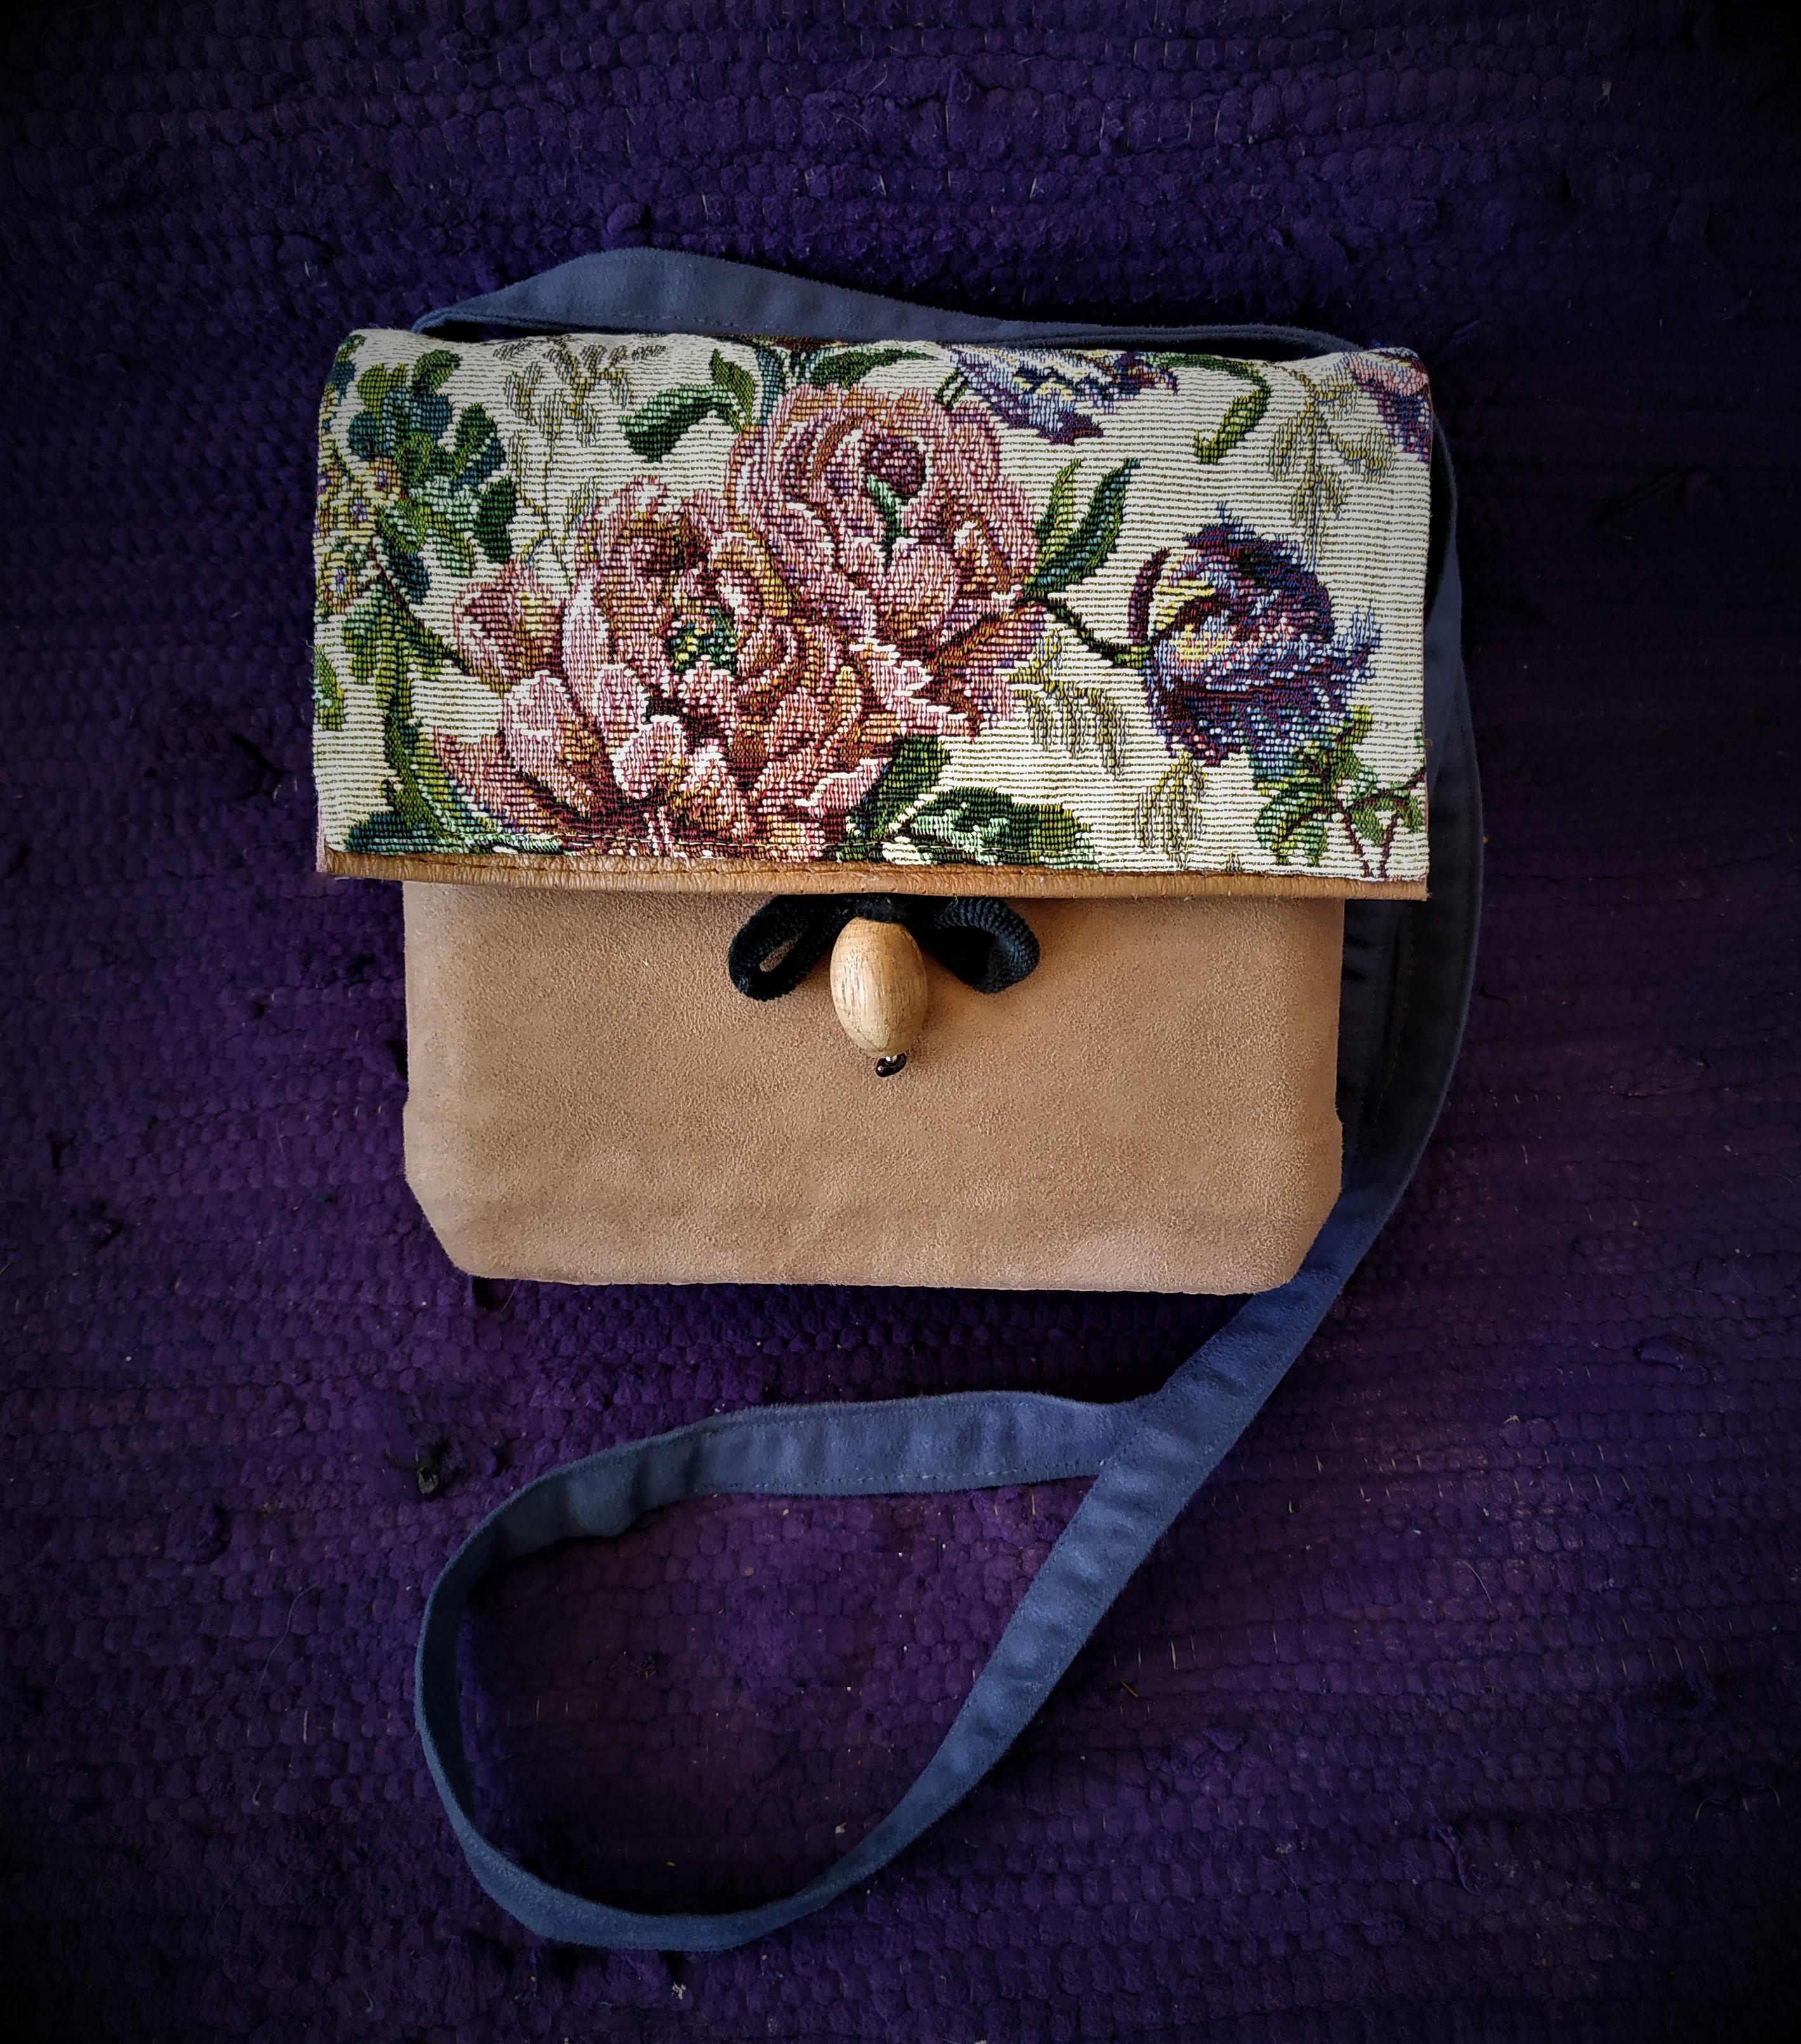 Box-bag on a plastic base